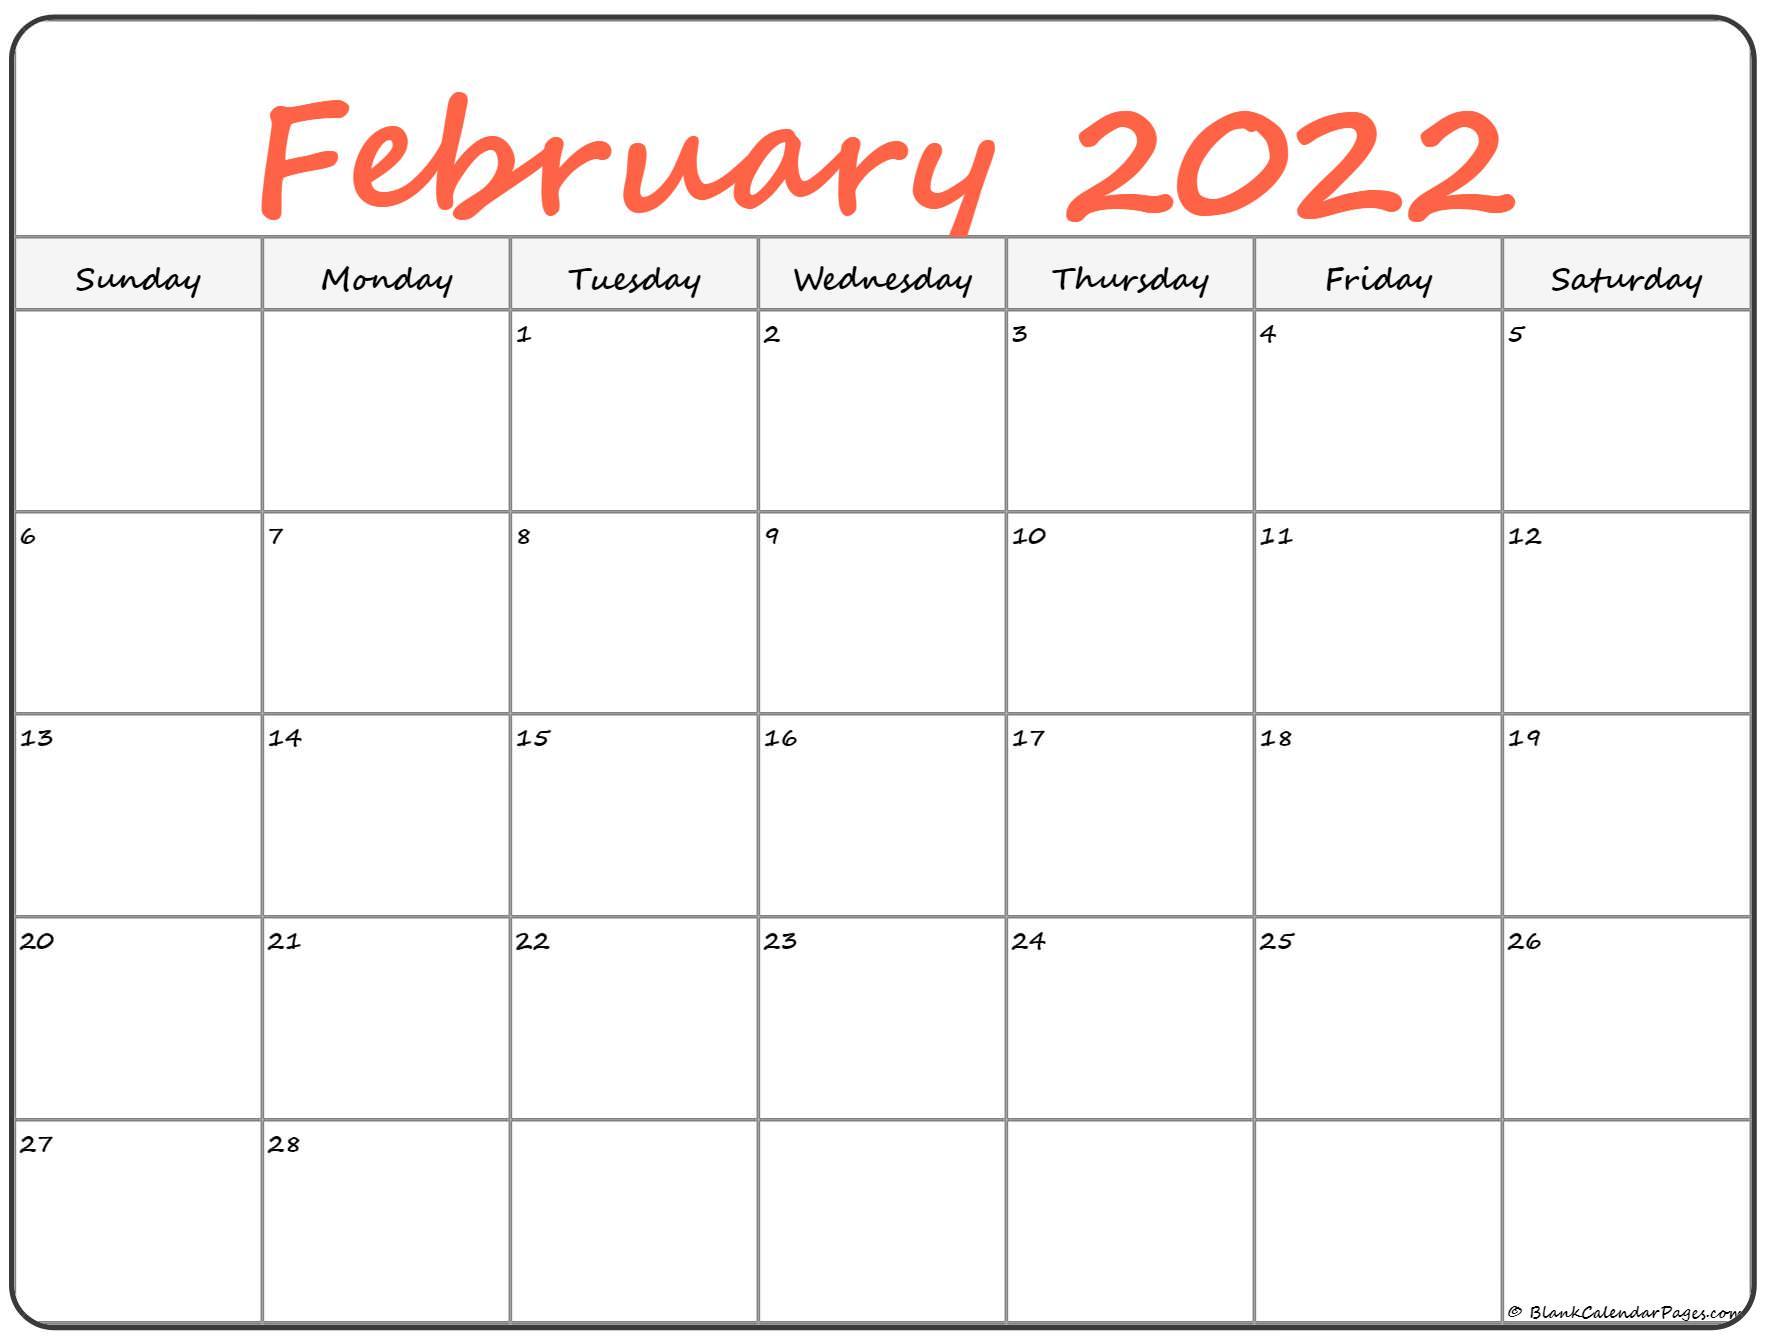 February 2022 Calendar | Free Printable Calendar Templates For Fillable February 2022 Calendar